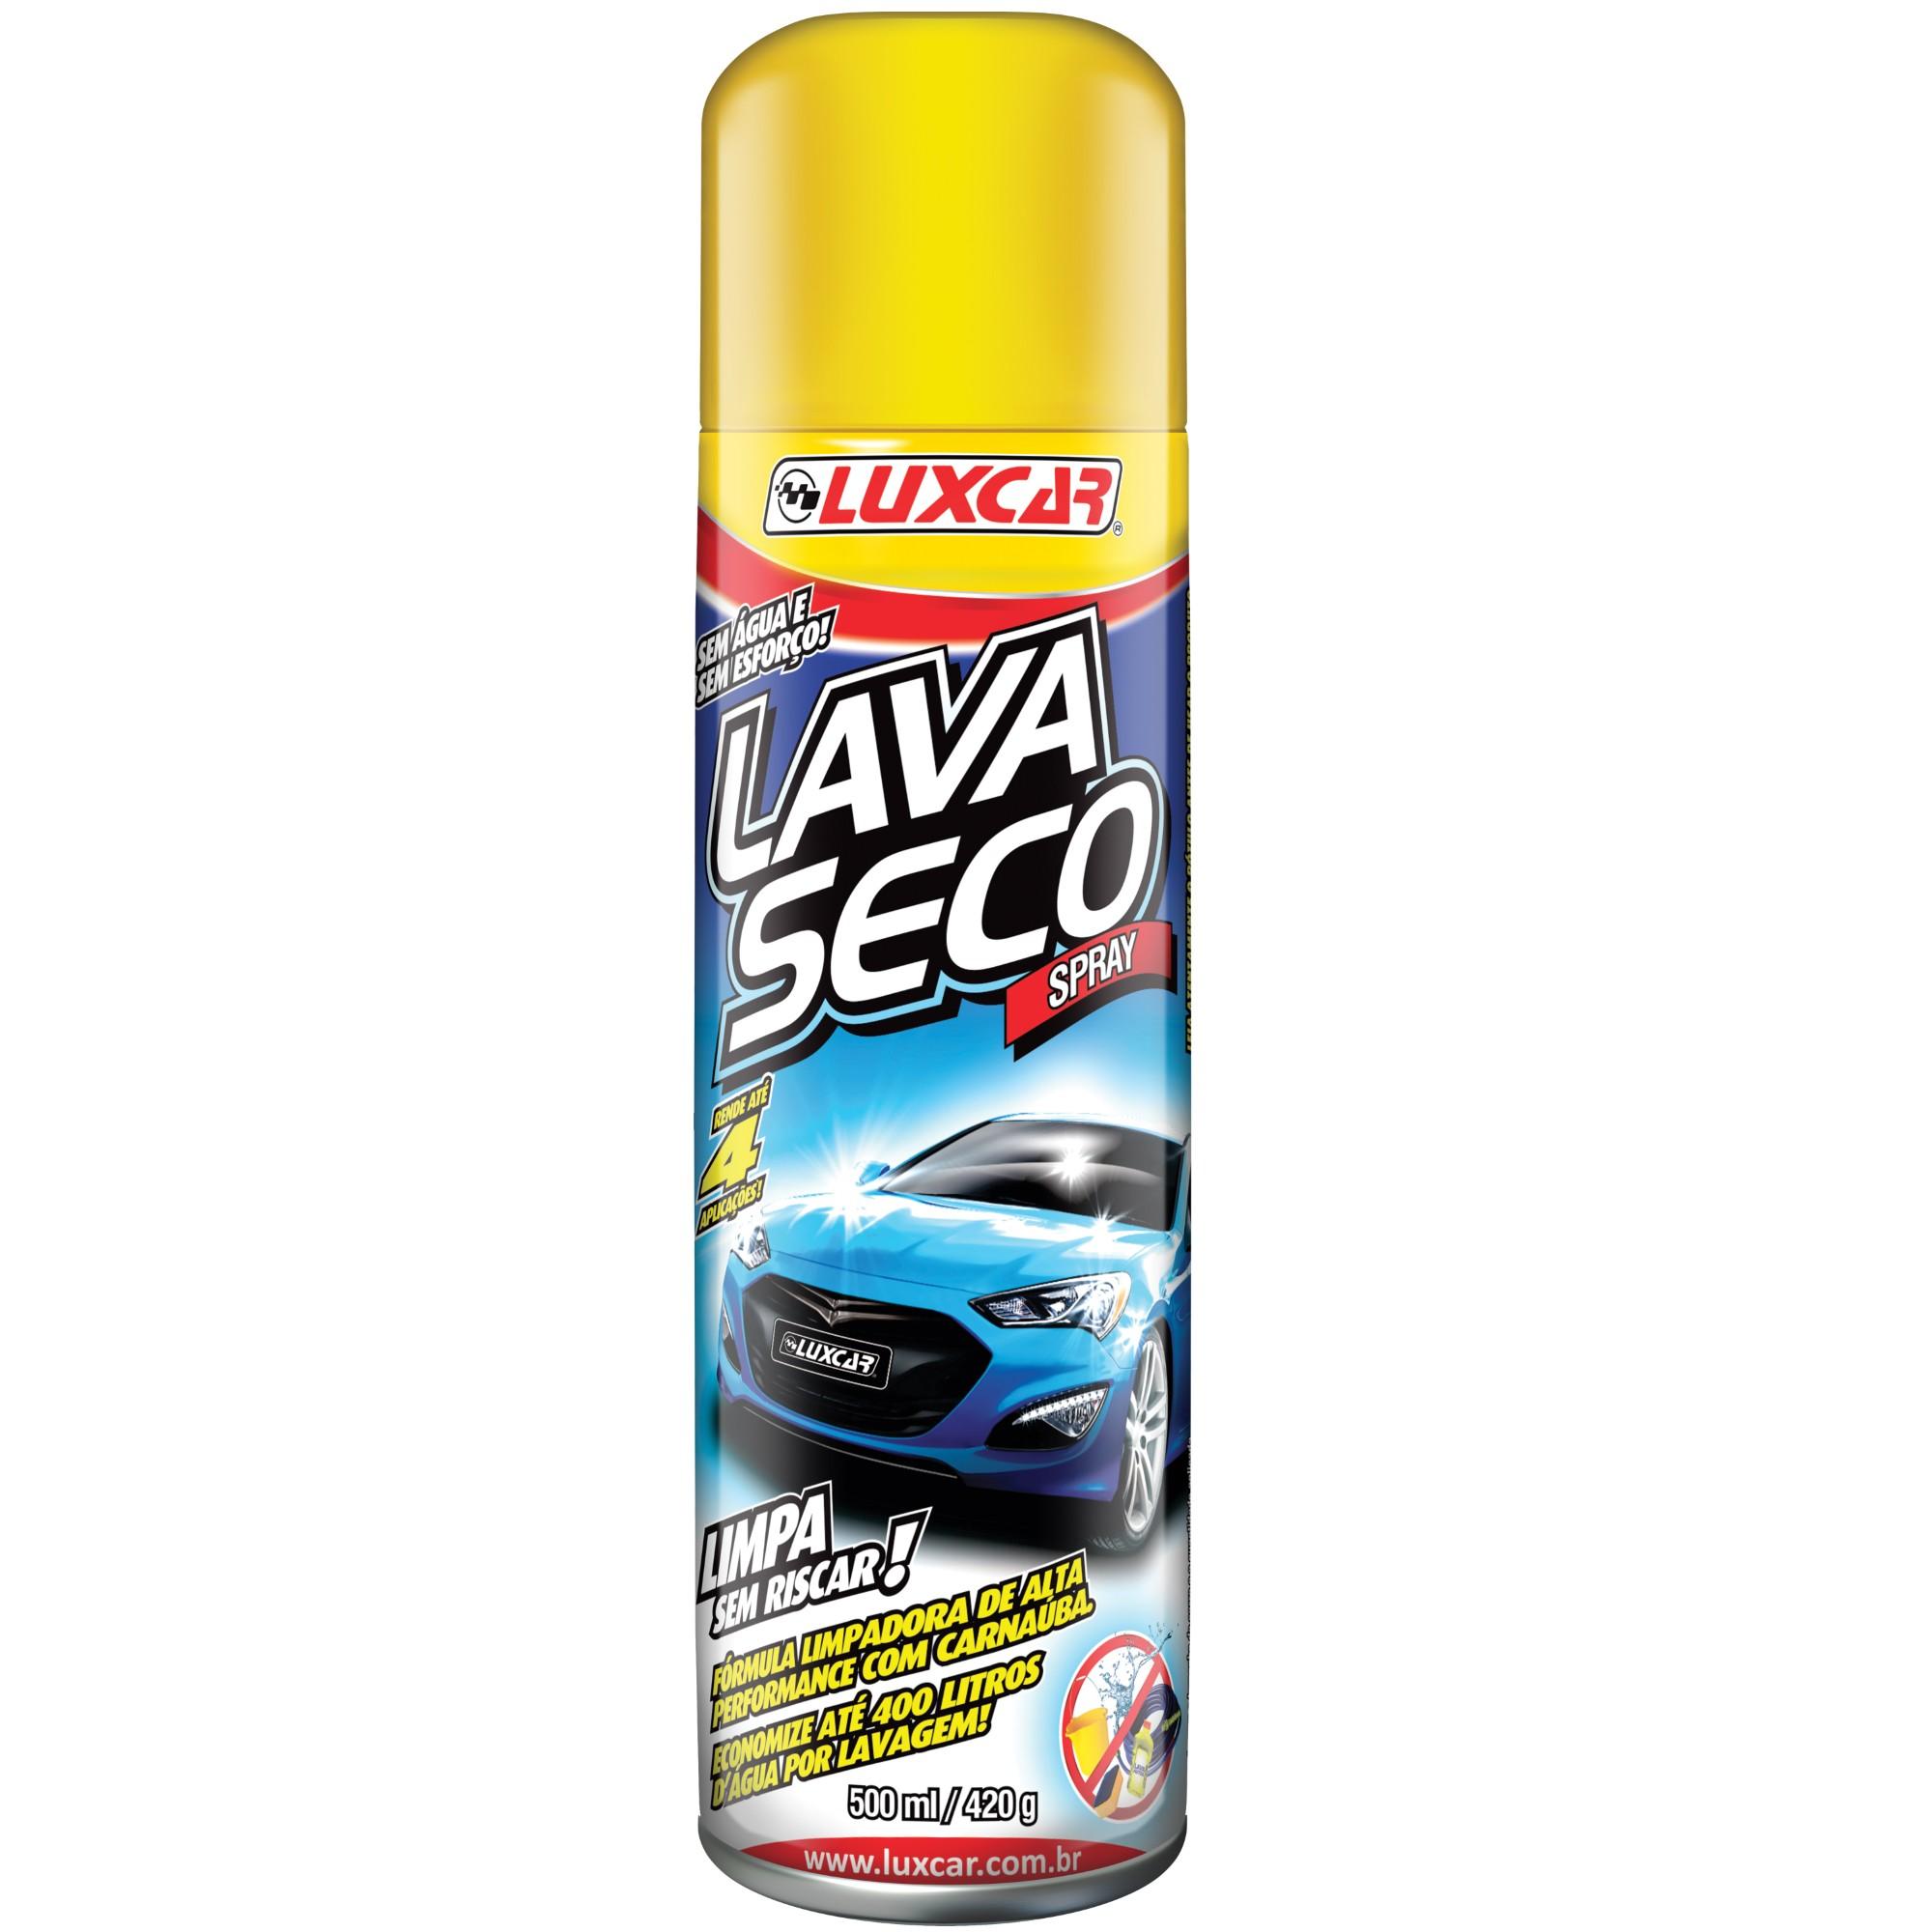 Spray de Lavagem a Seco 500 ml - 2595 - Luxcar